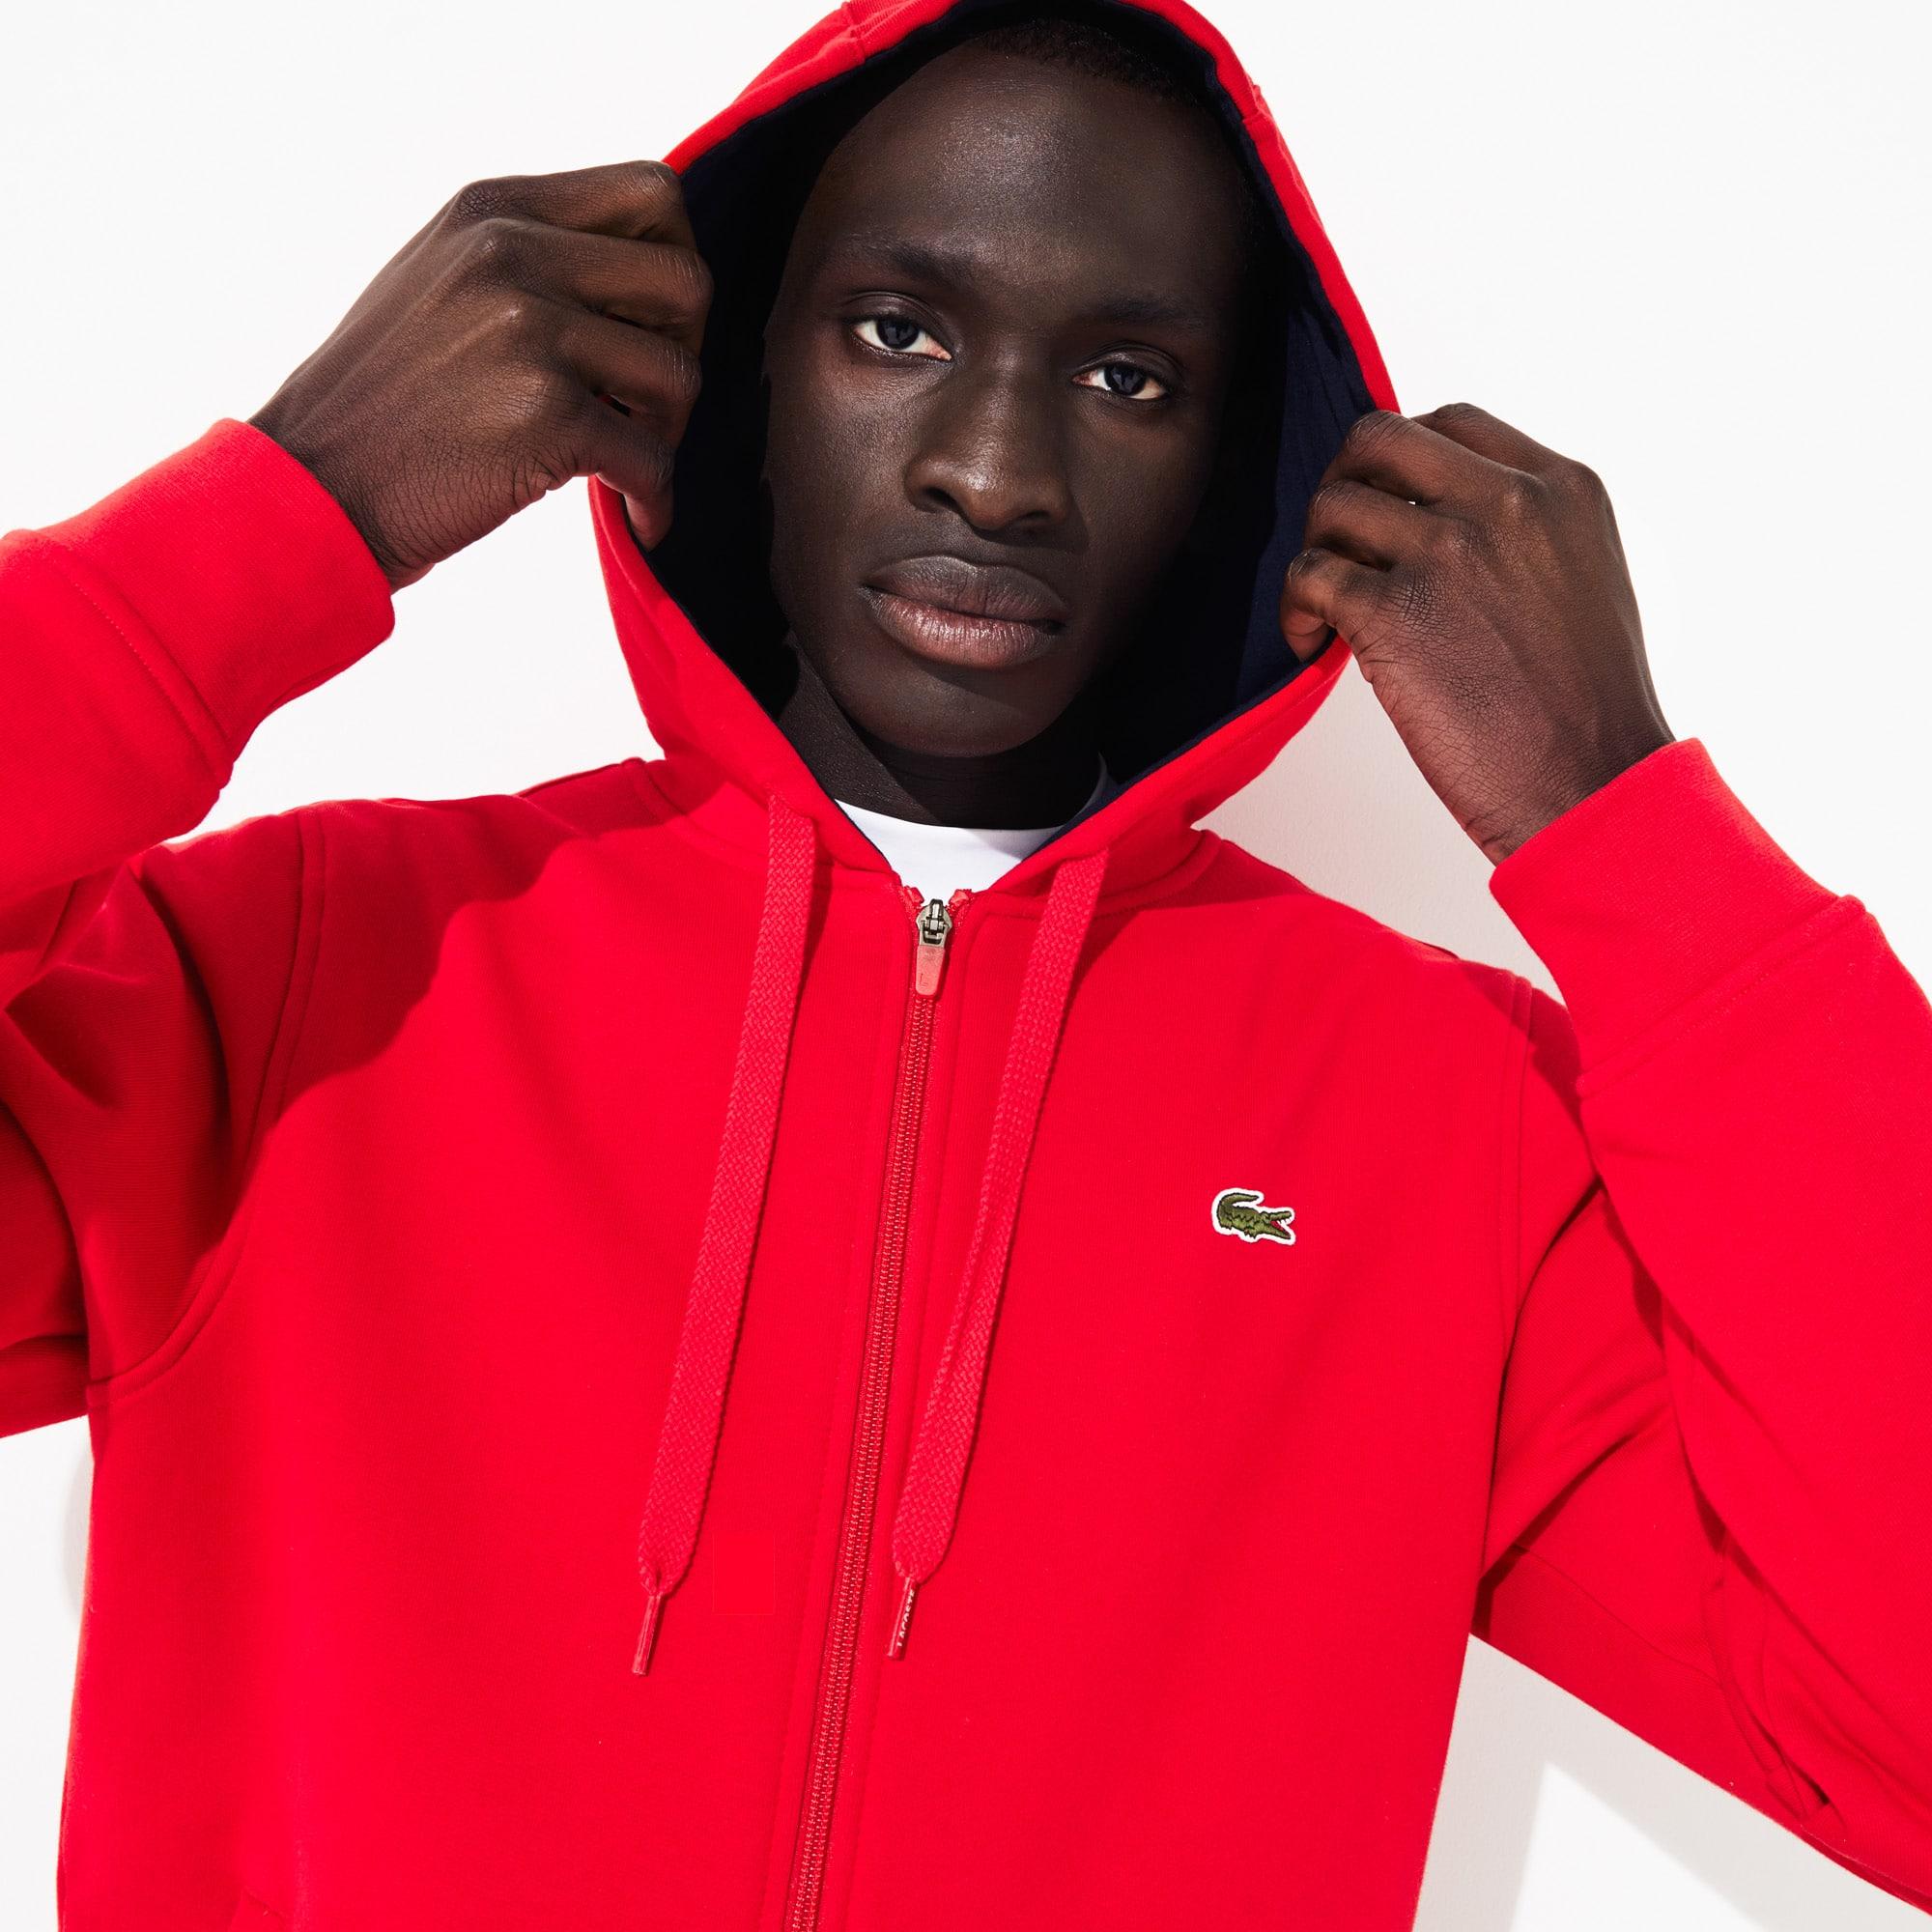 085c4f49 Sweatshirts for men   Men's fashion   LACOSTE